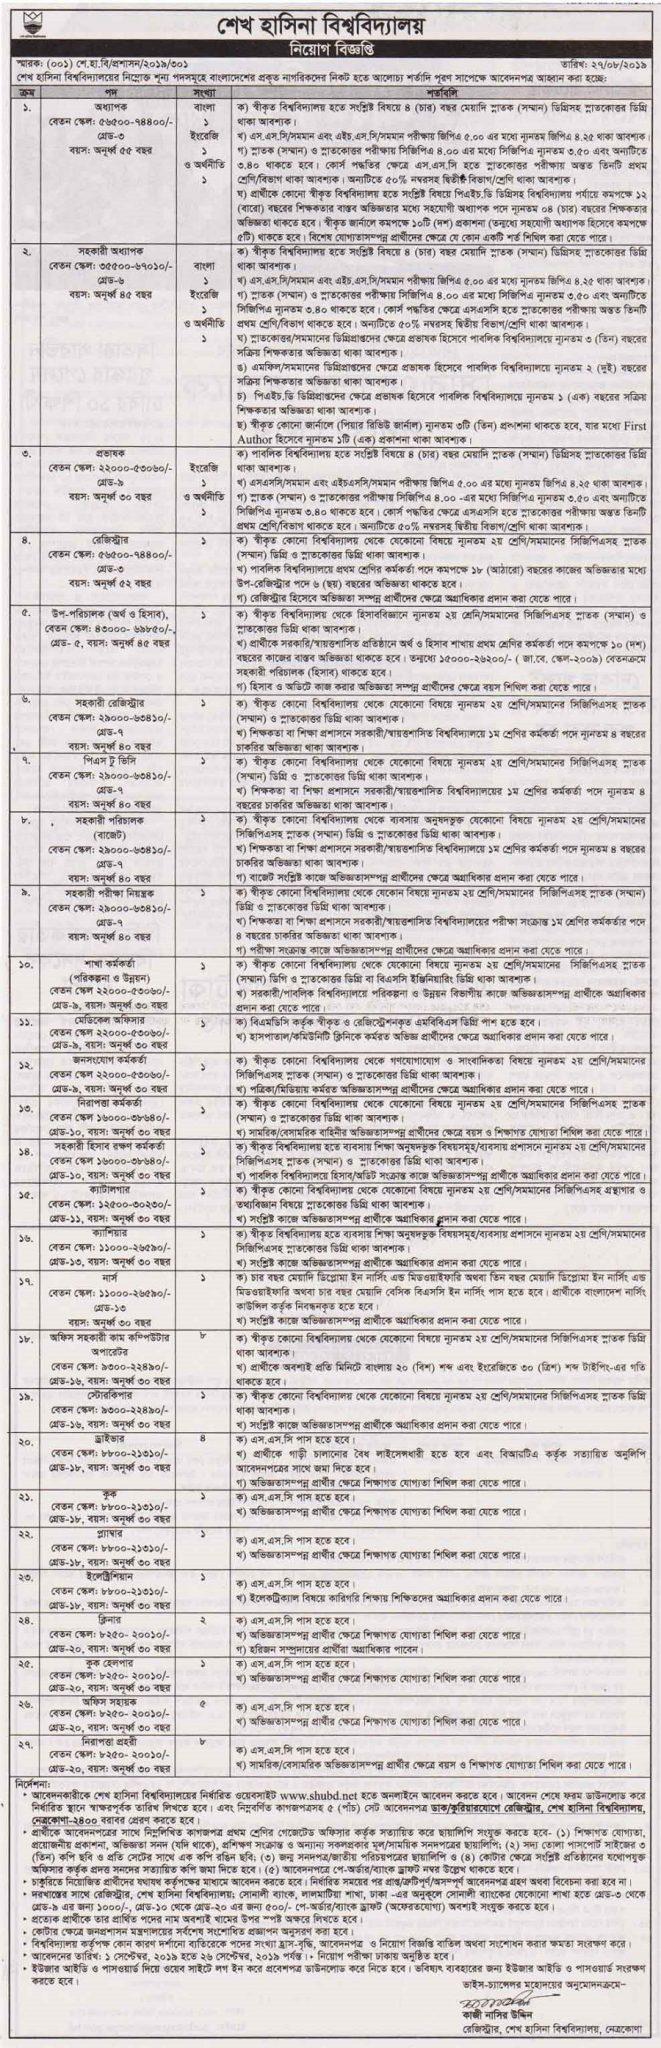 Sheikh Hasina University Job Circular 2019